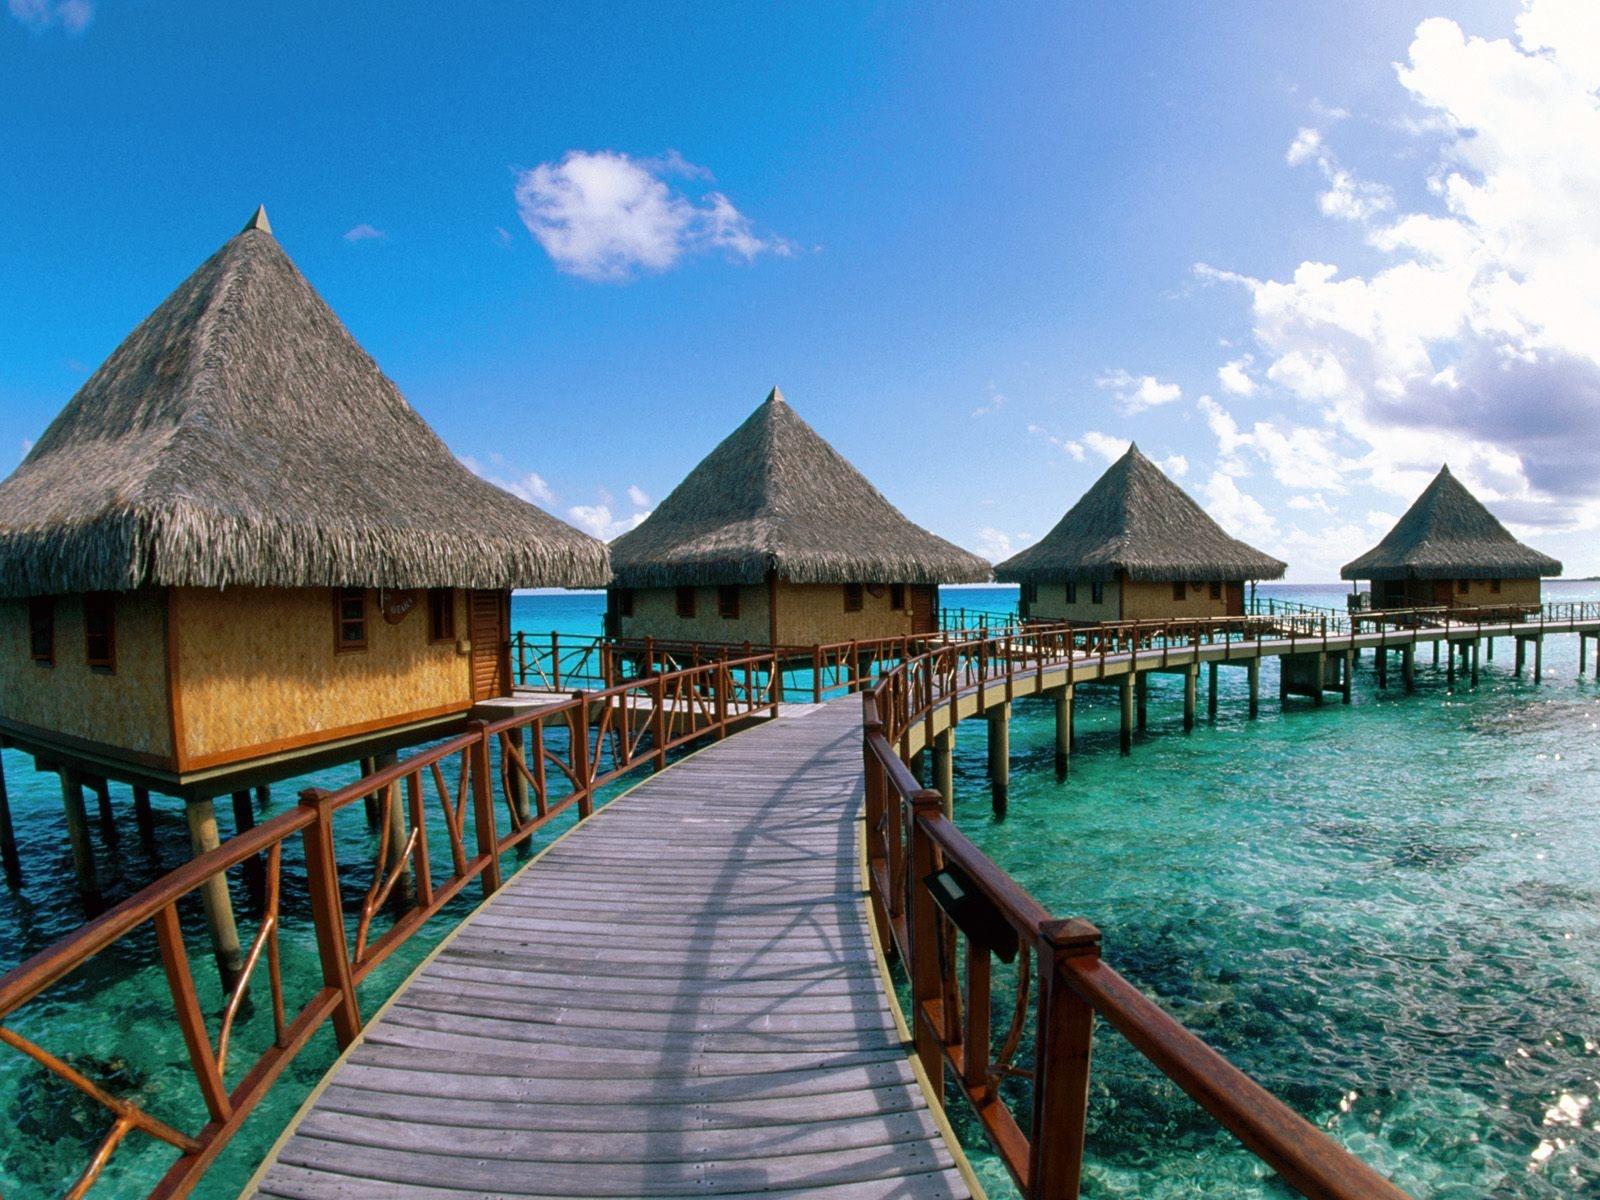 Bora Bora Beach Tourism Wallpaper   Travel HD Wallpapers 1600x1200